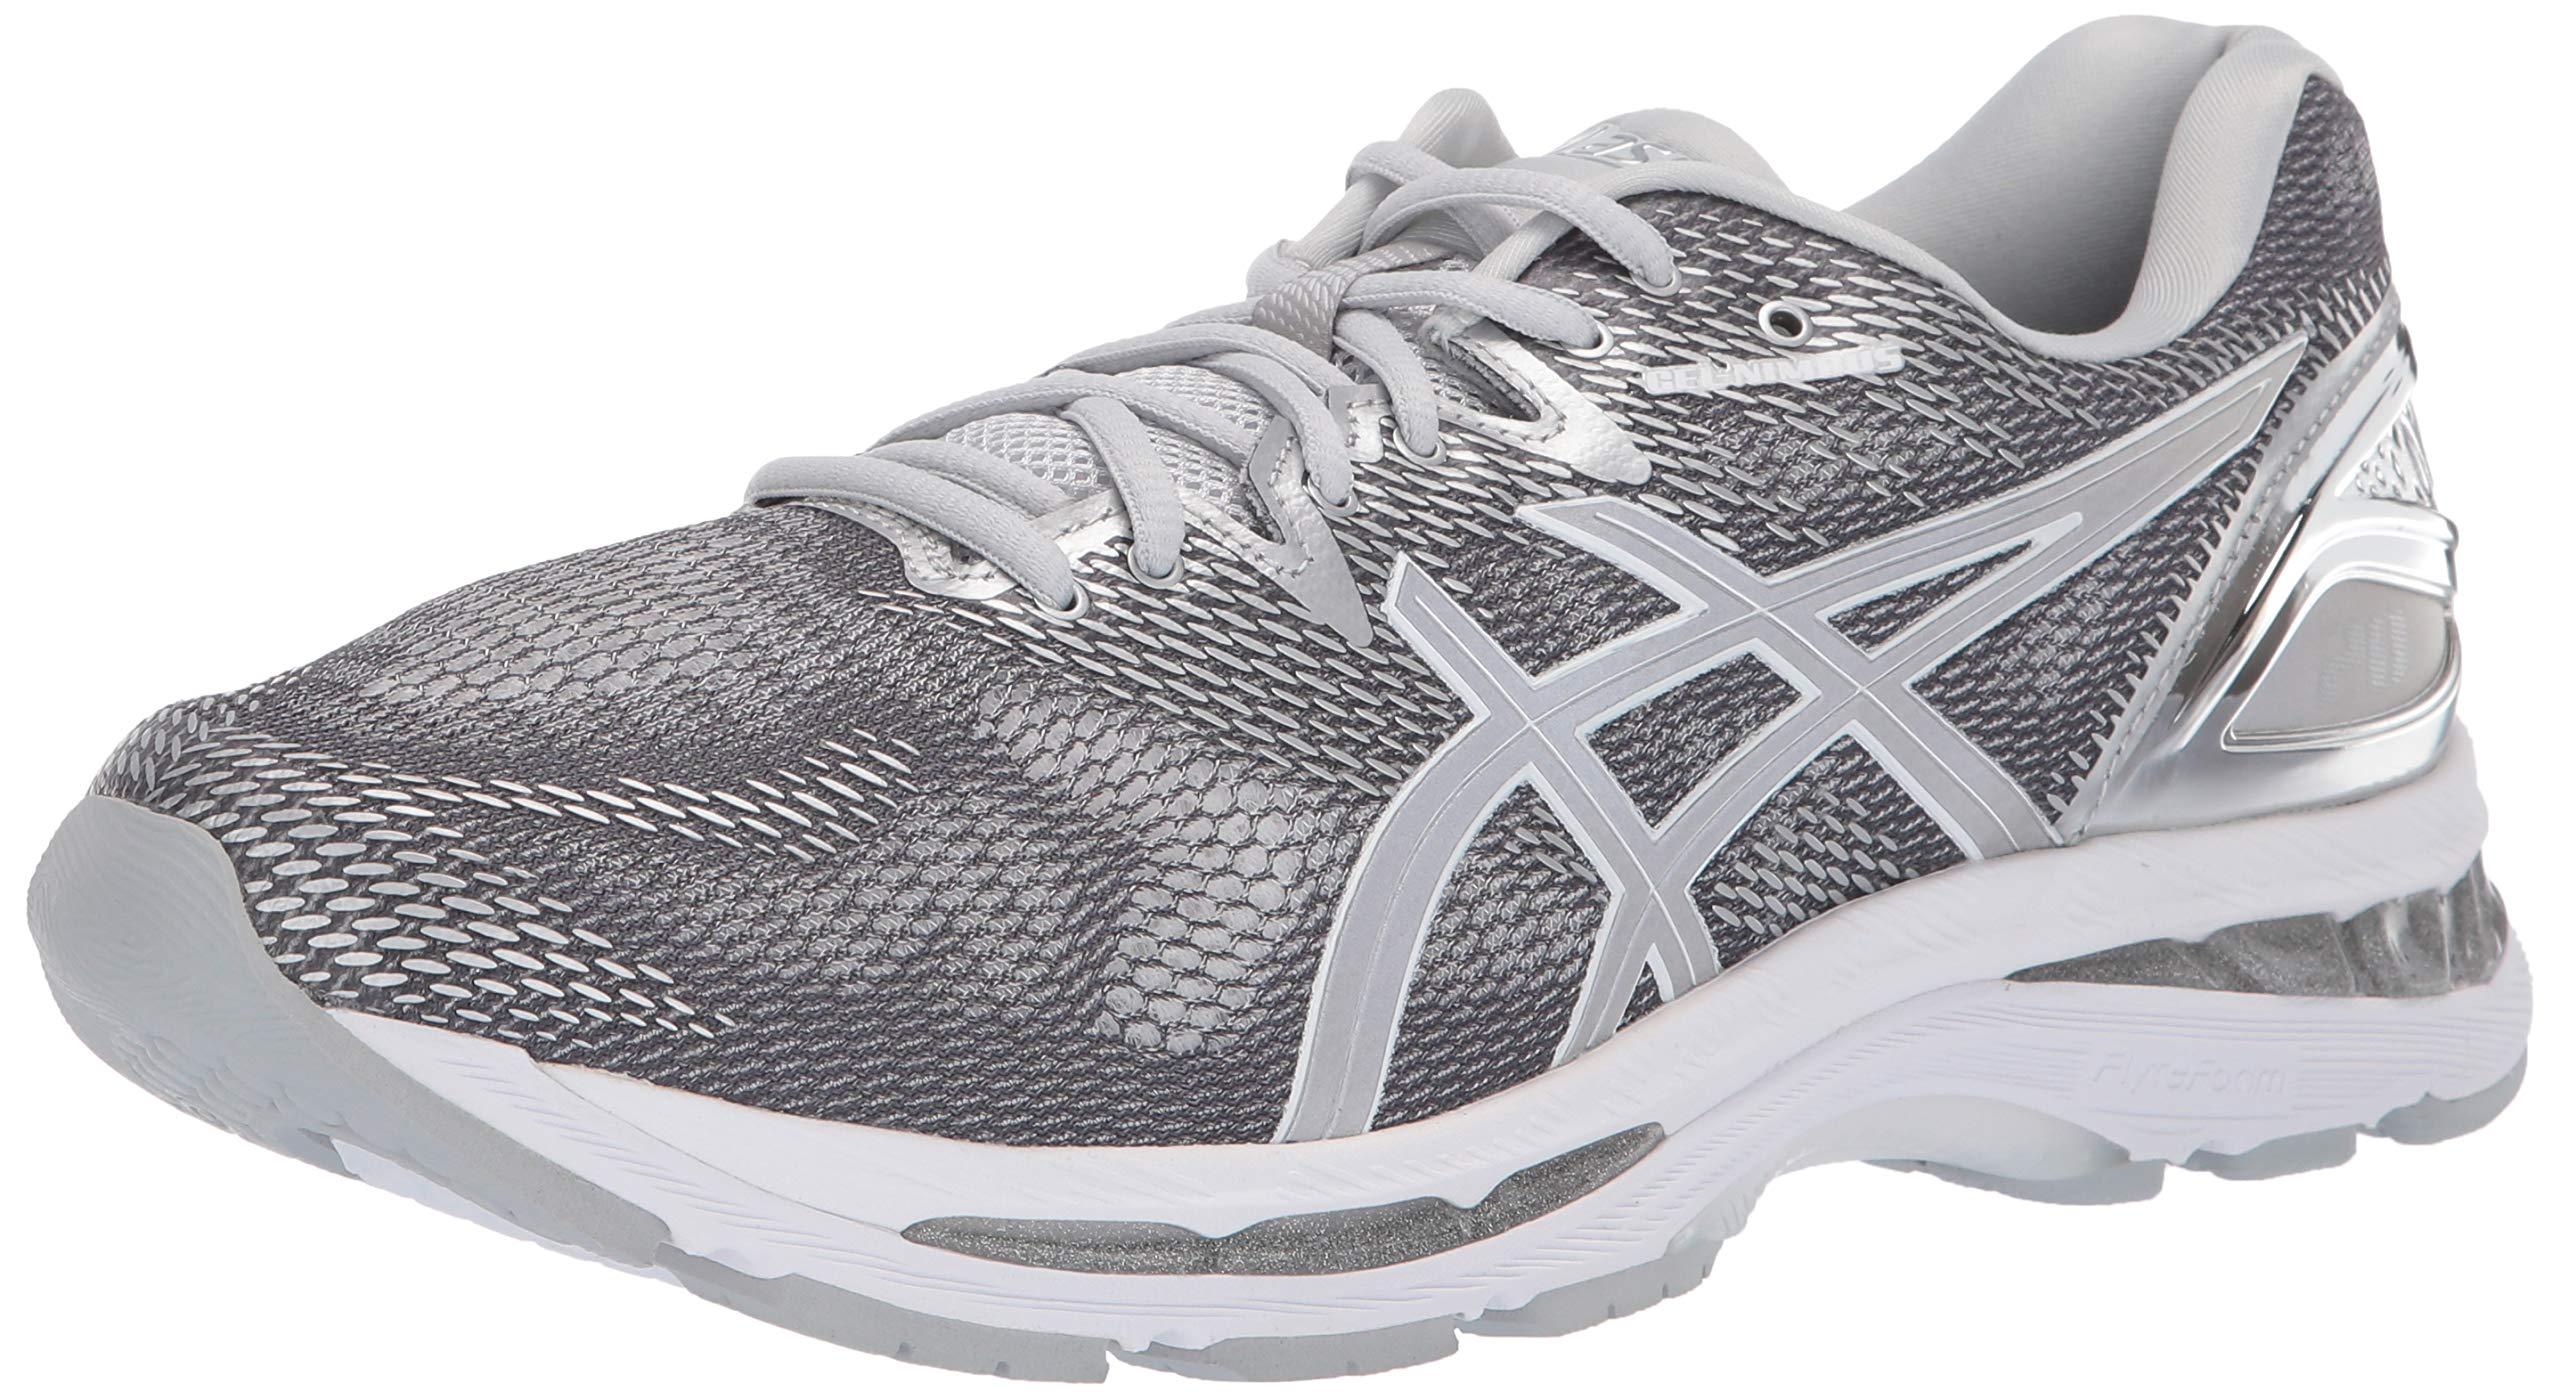 ASICS Mens Fitness/Cross-Training Trail Running Shoe, Carbon/Silver/White, 14 Medium US